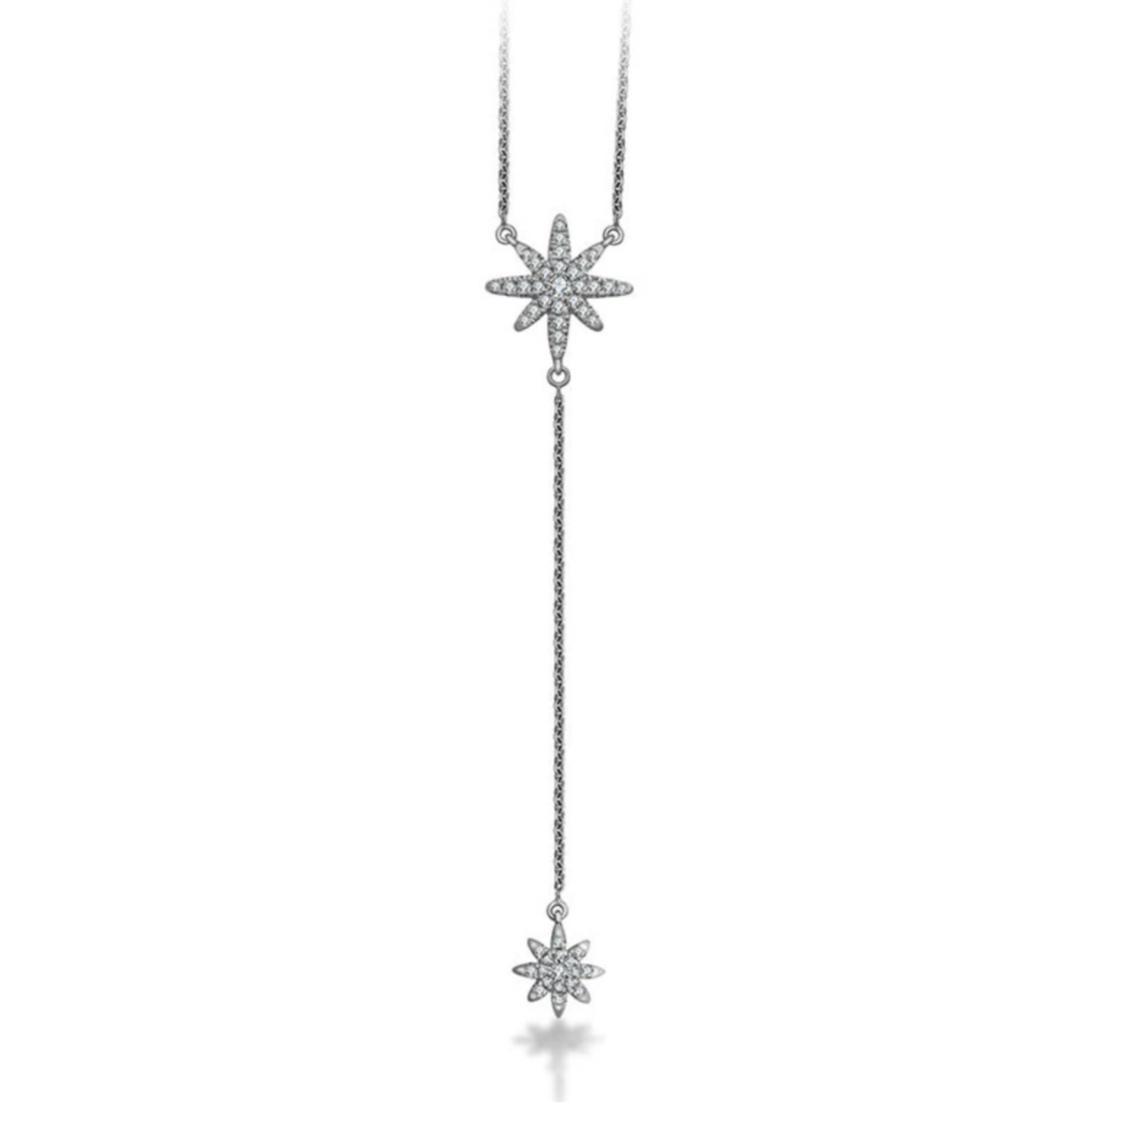 Gargantilha Shiny Star Y Ouro branco 18k e Diamantes